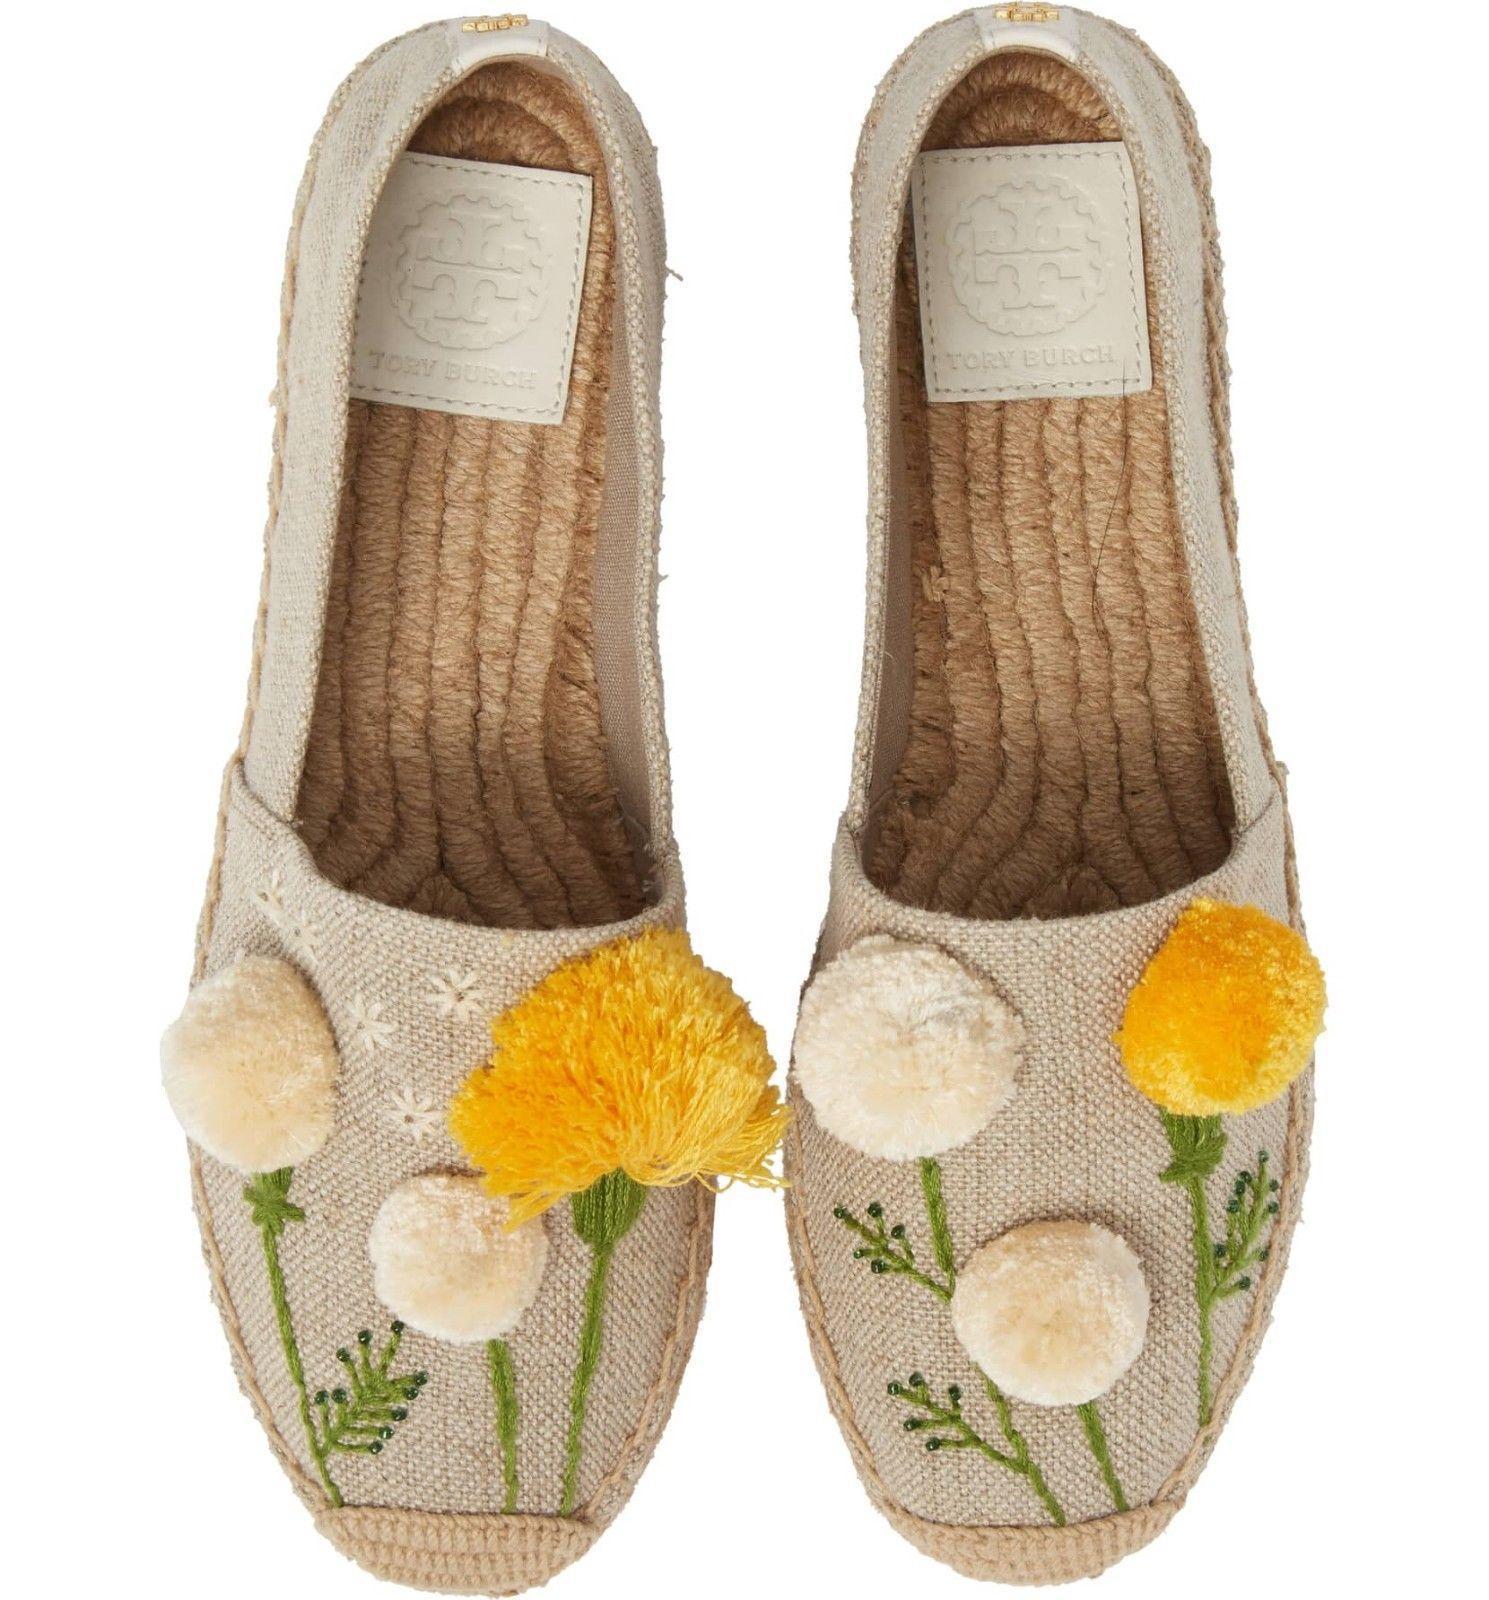 Tory Burch Natural Linen Lily Pompom Platform Espadrilles Flats Shoes 7.5